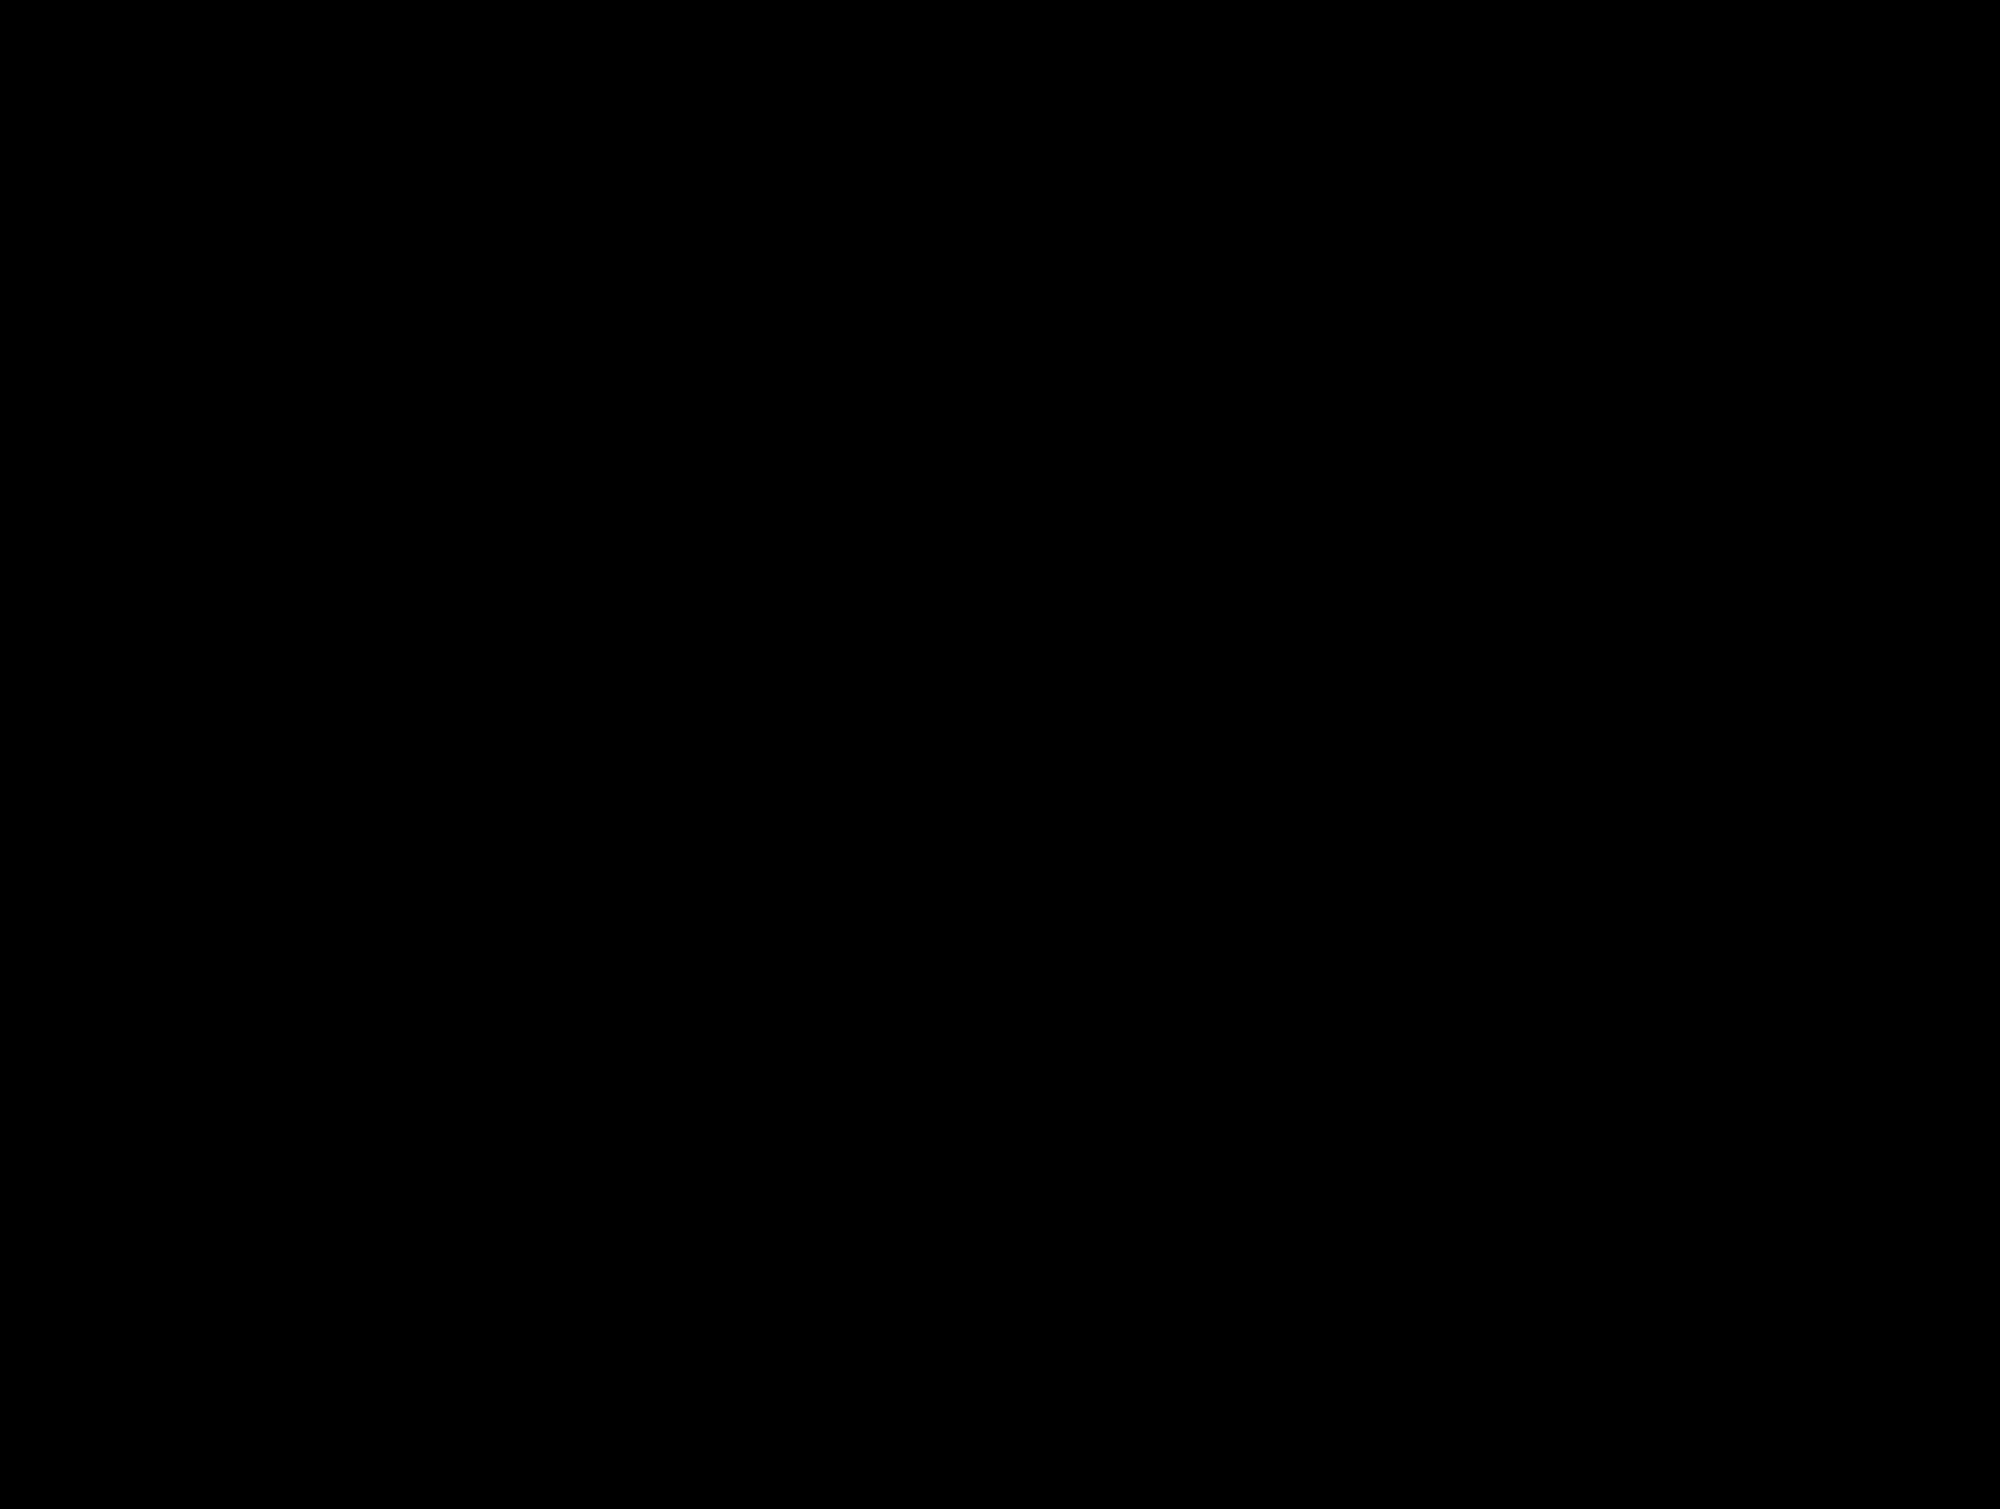 Open PlusPng.com  - Zebra PNG